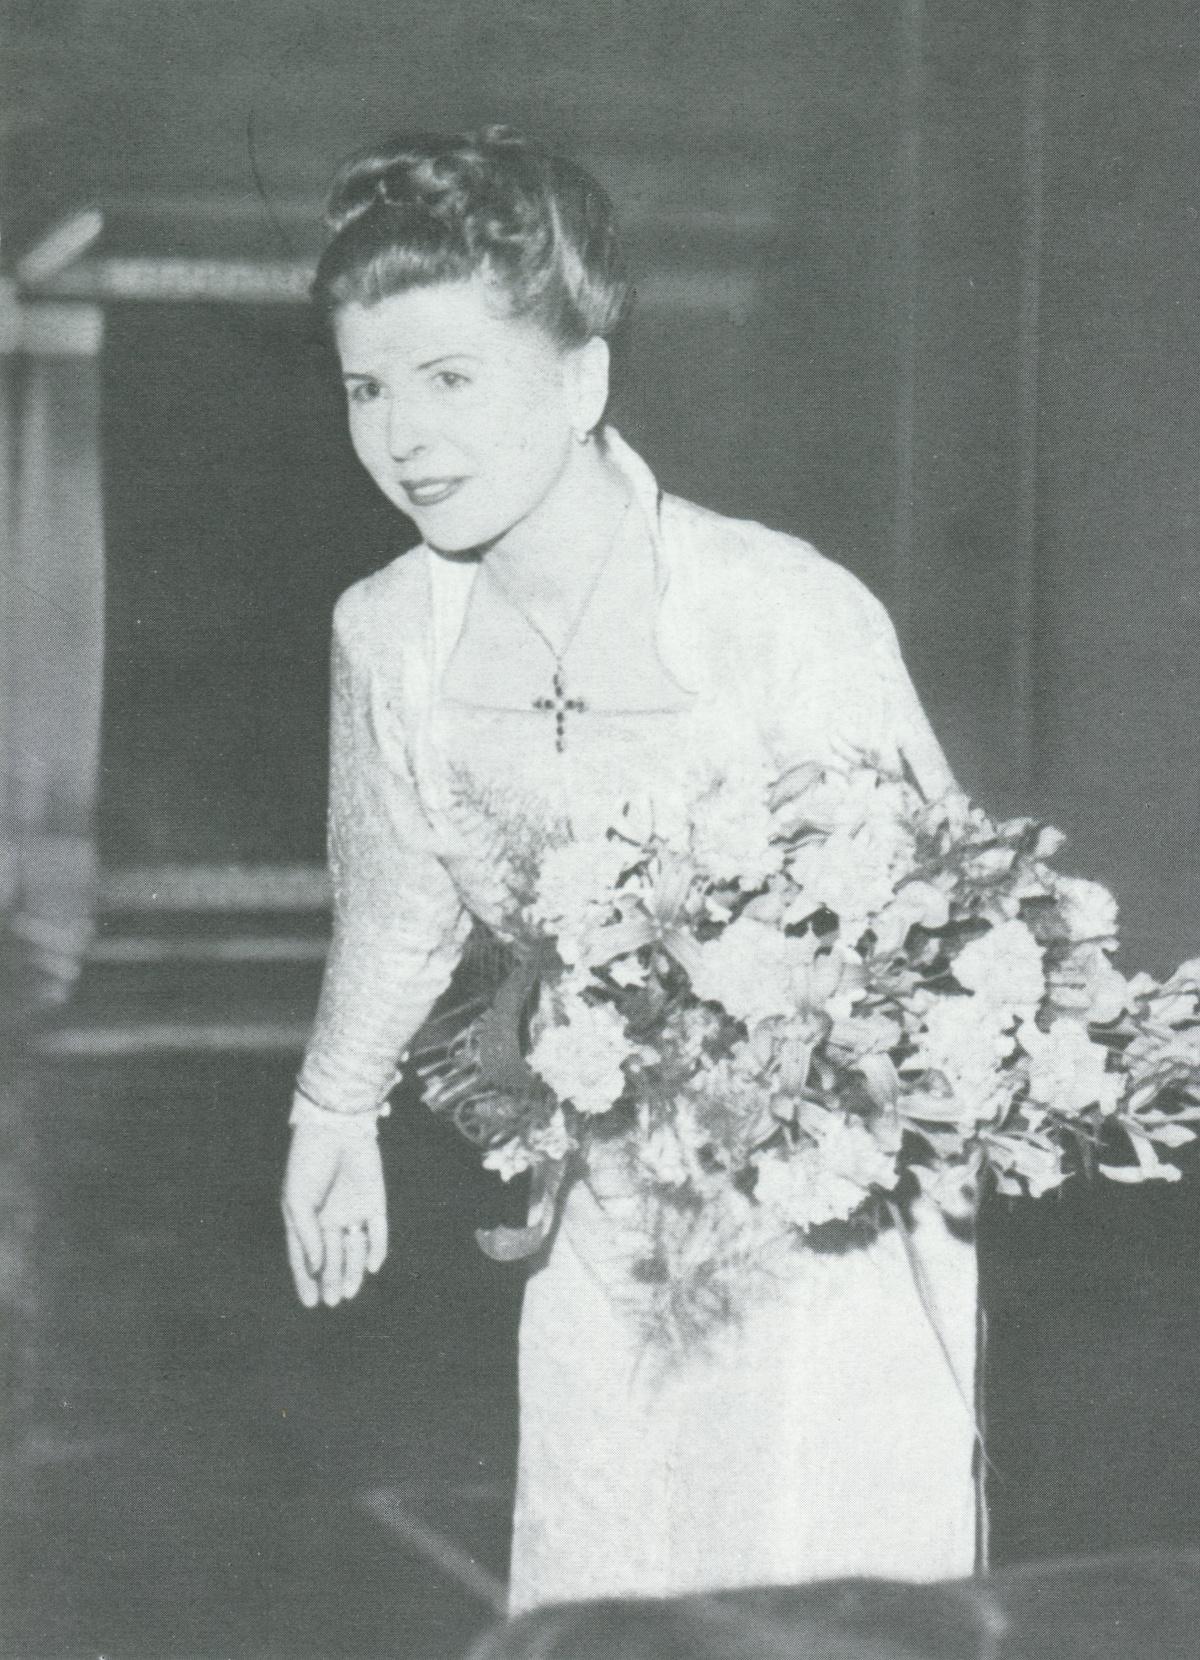 Maria STADER, Goldsmith Hall, London, 1951, cliquer pour une vue agrandie